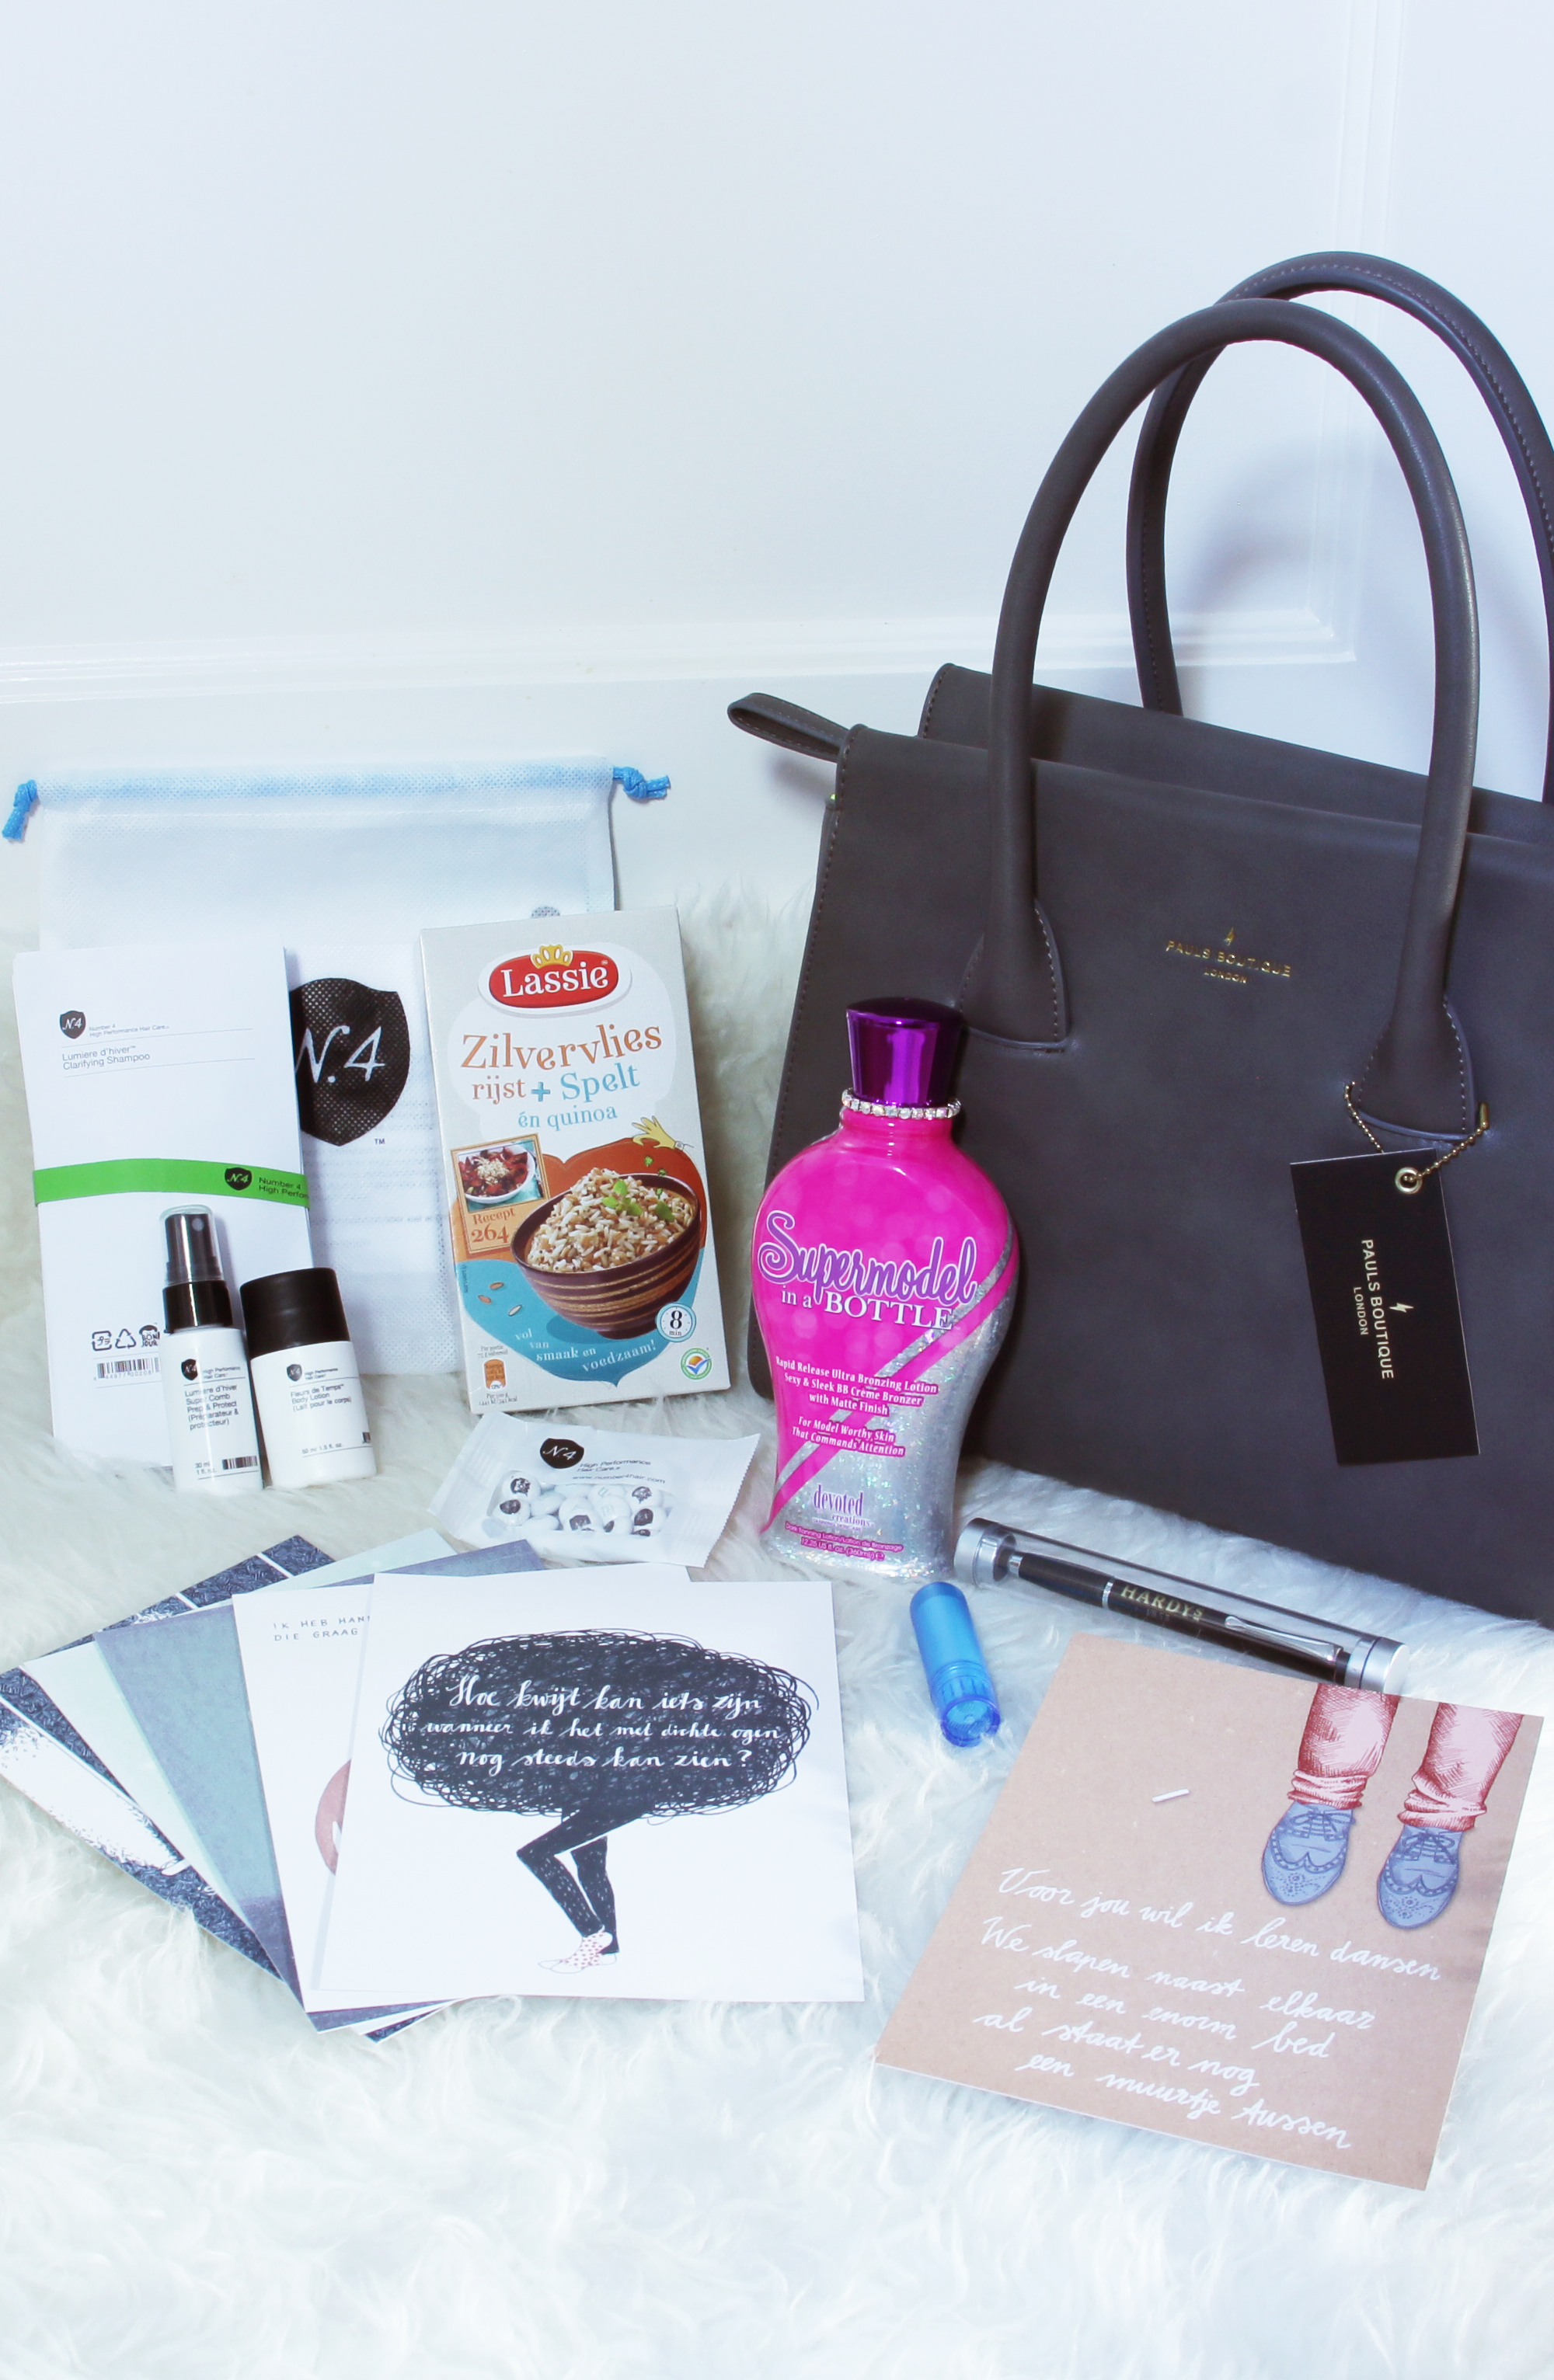 #StyleBlogger Bethany handbag Pauls Boutique London Exclusive Style Blogger Event #PBESBE amsterdam vlog verslag lifestyle by linda fashion mode tassen